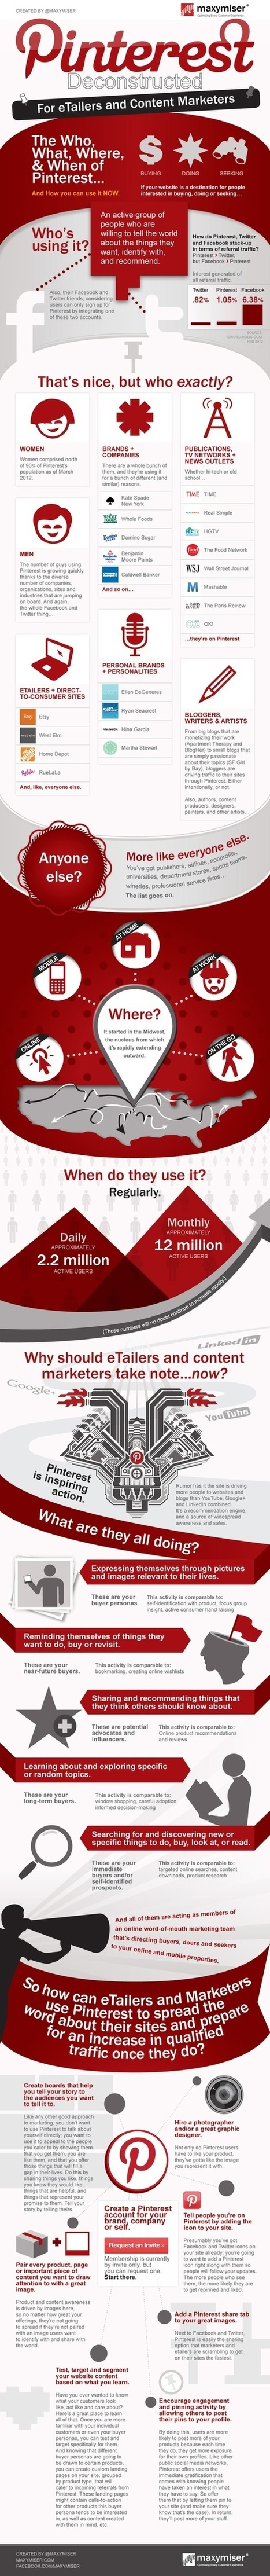 Pinterest Deconstructed [Infographic] | Amazing Infographs | Scoop.it